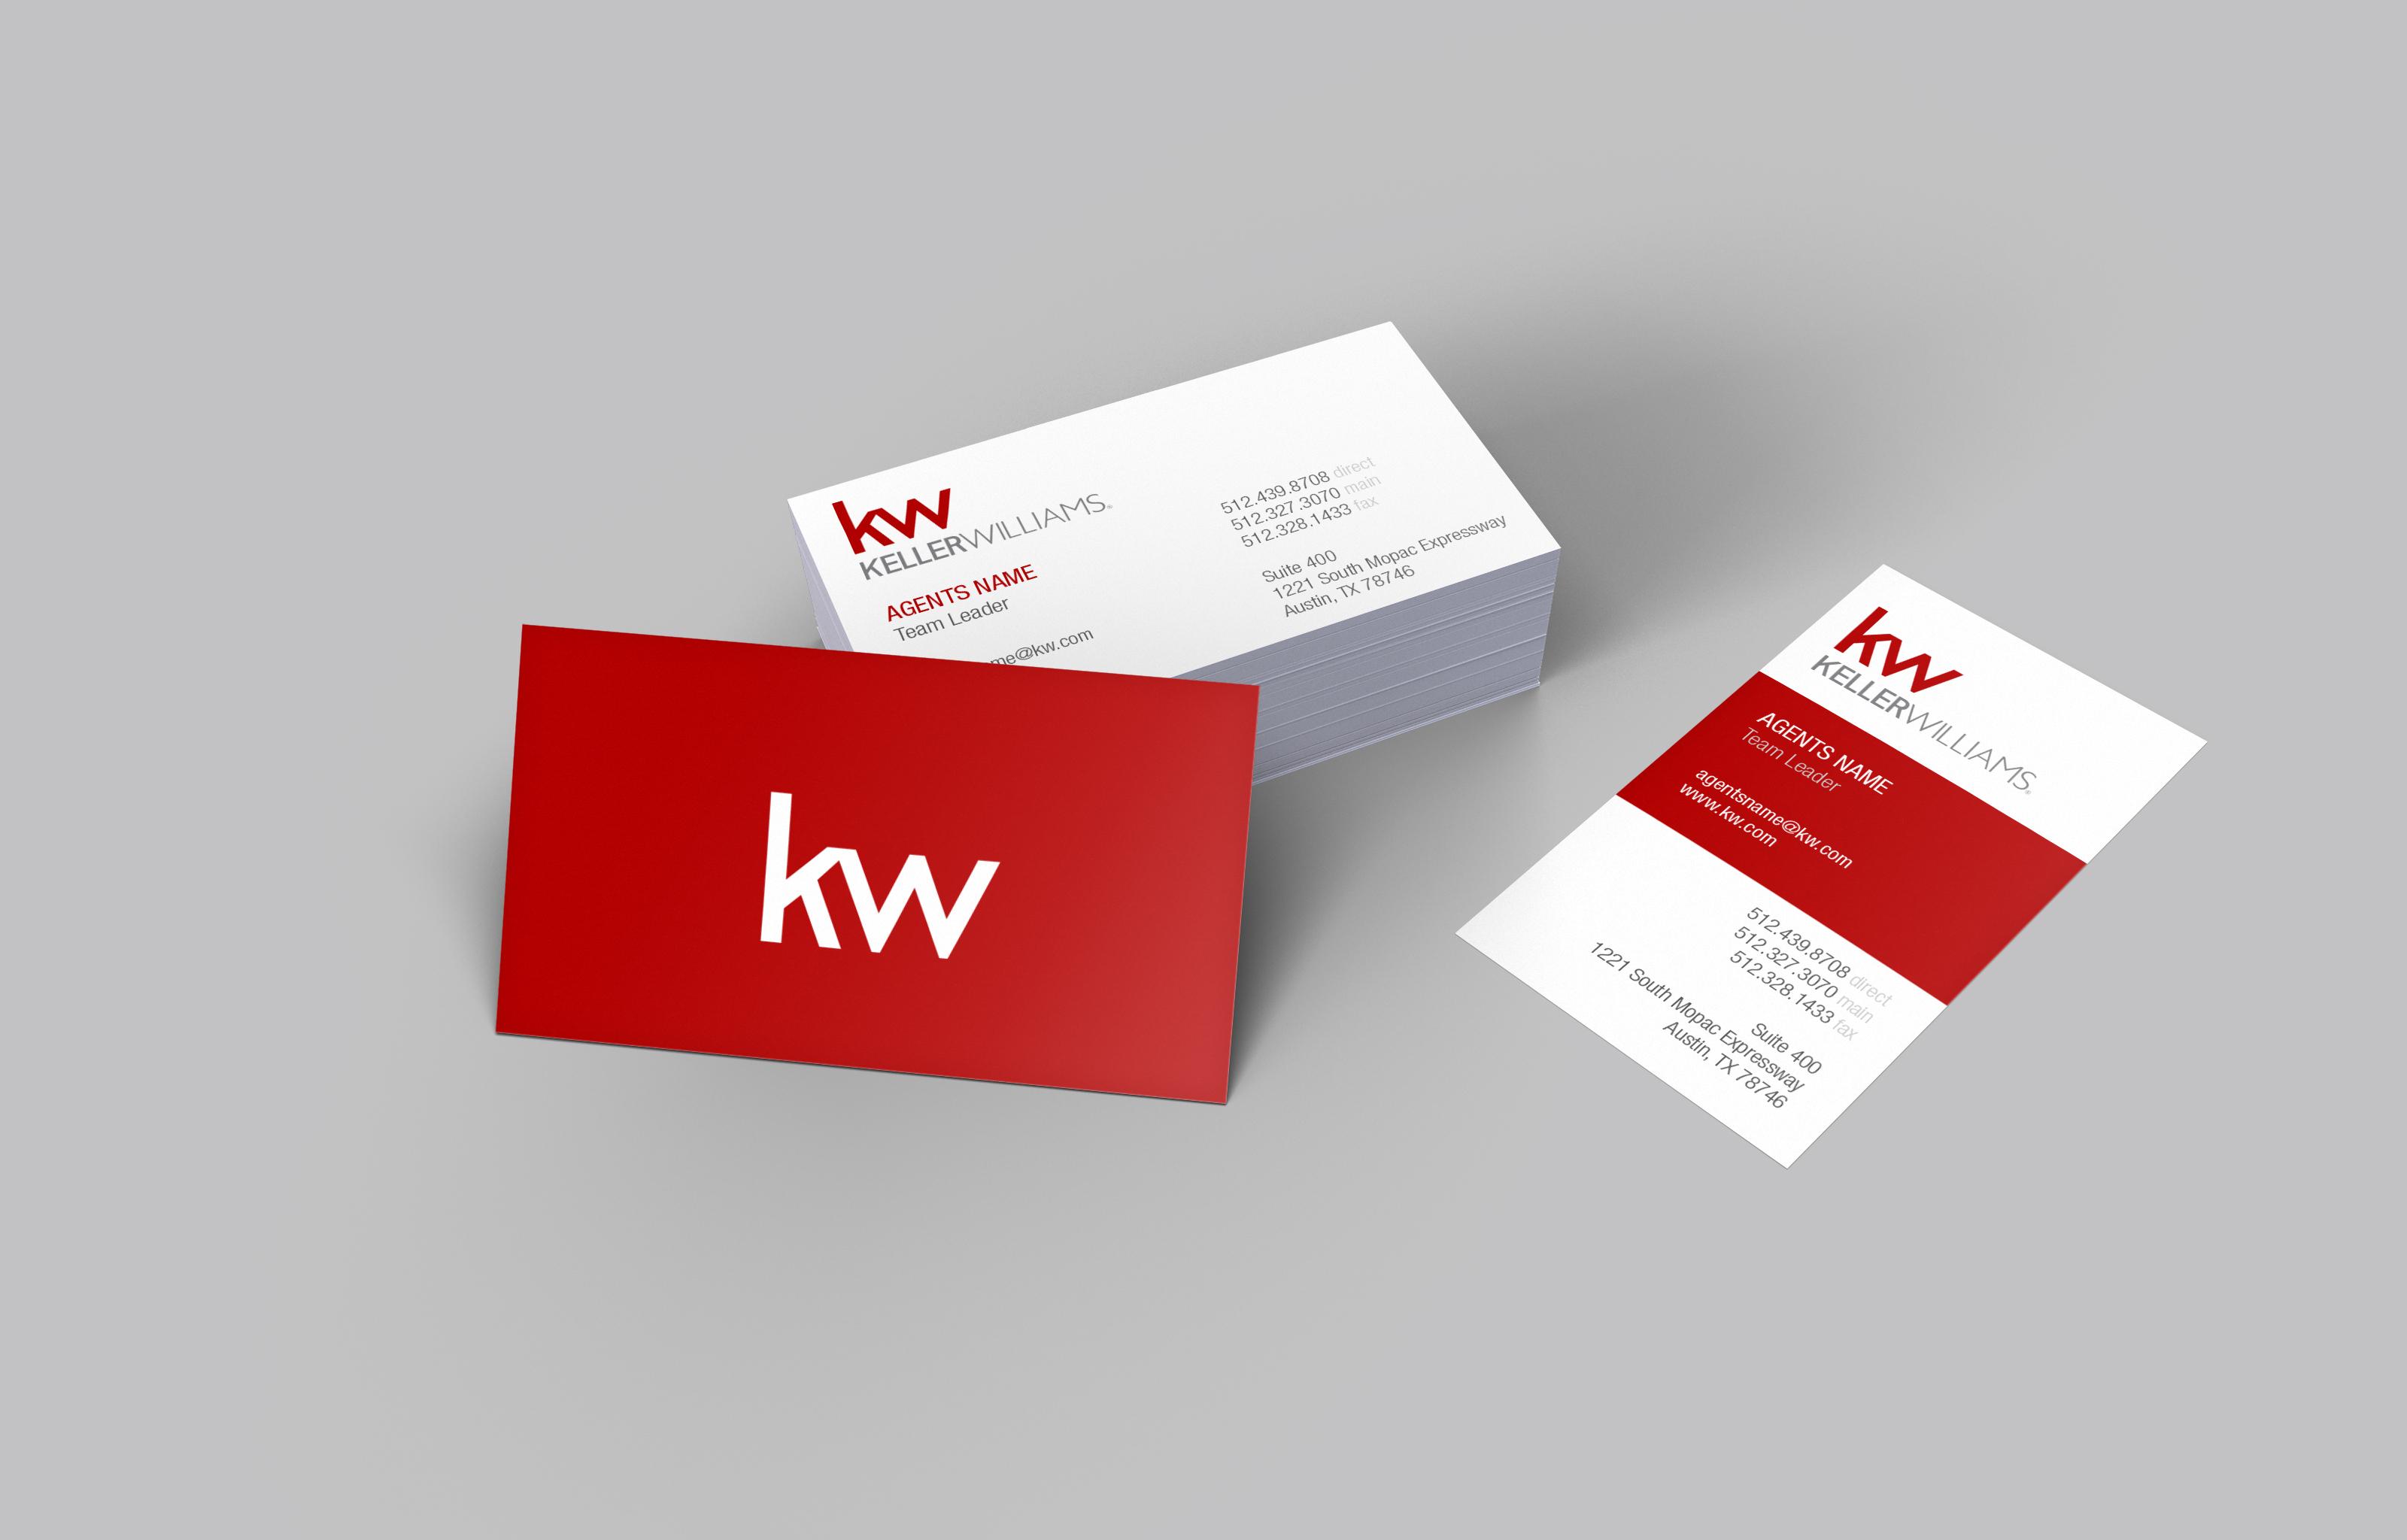 keller williams unveils new logo launches rebranding campaign